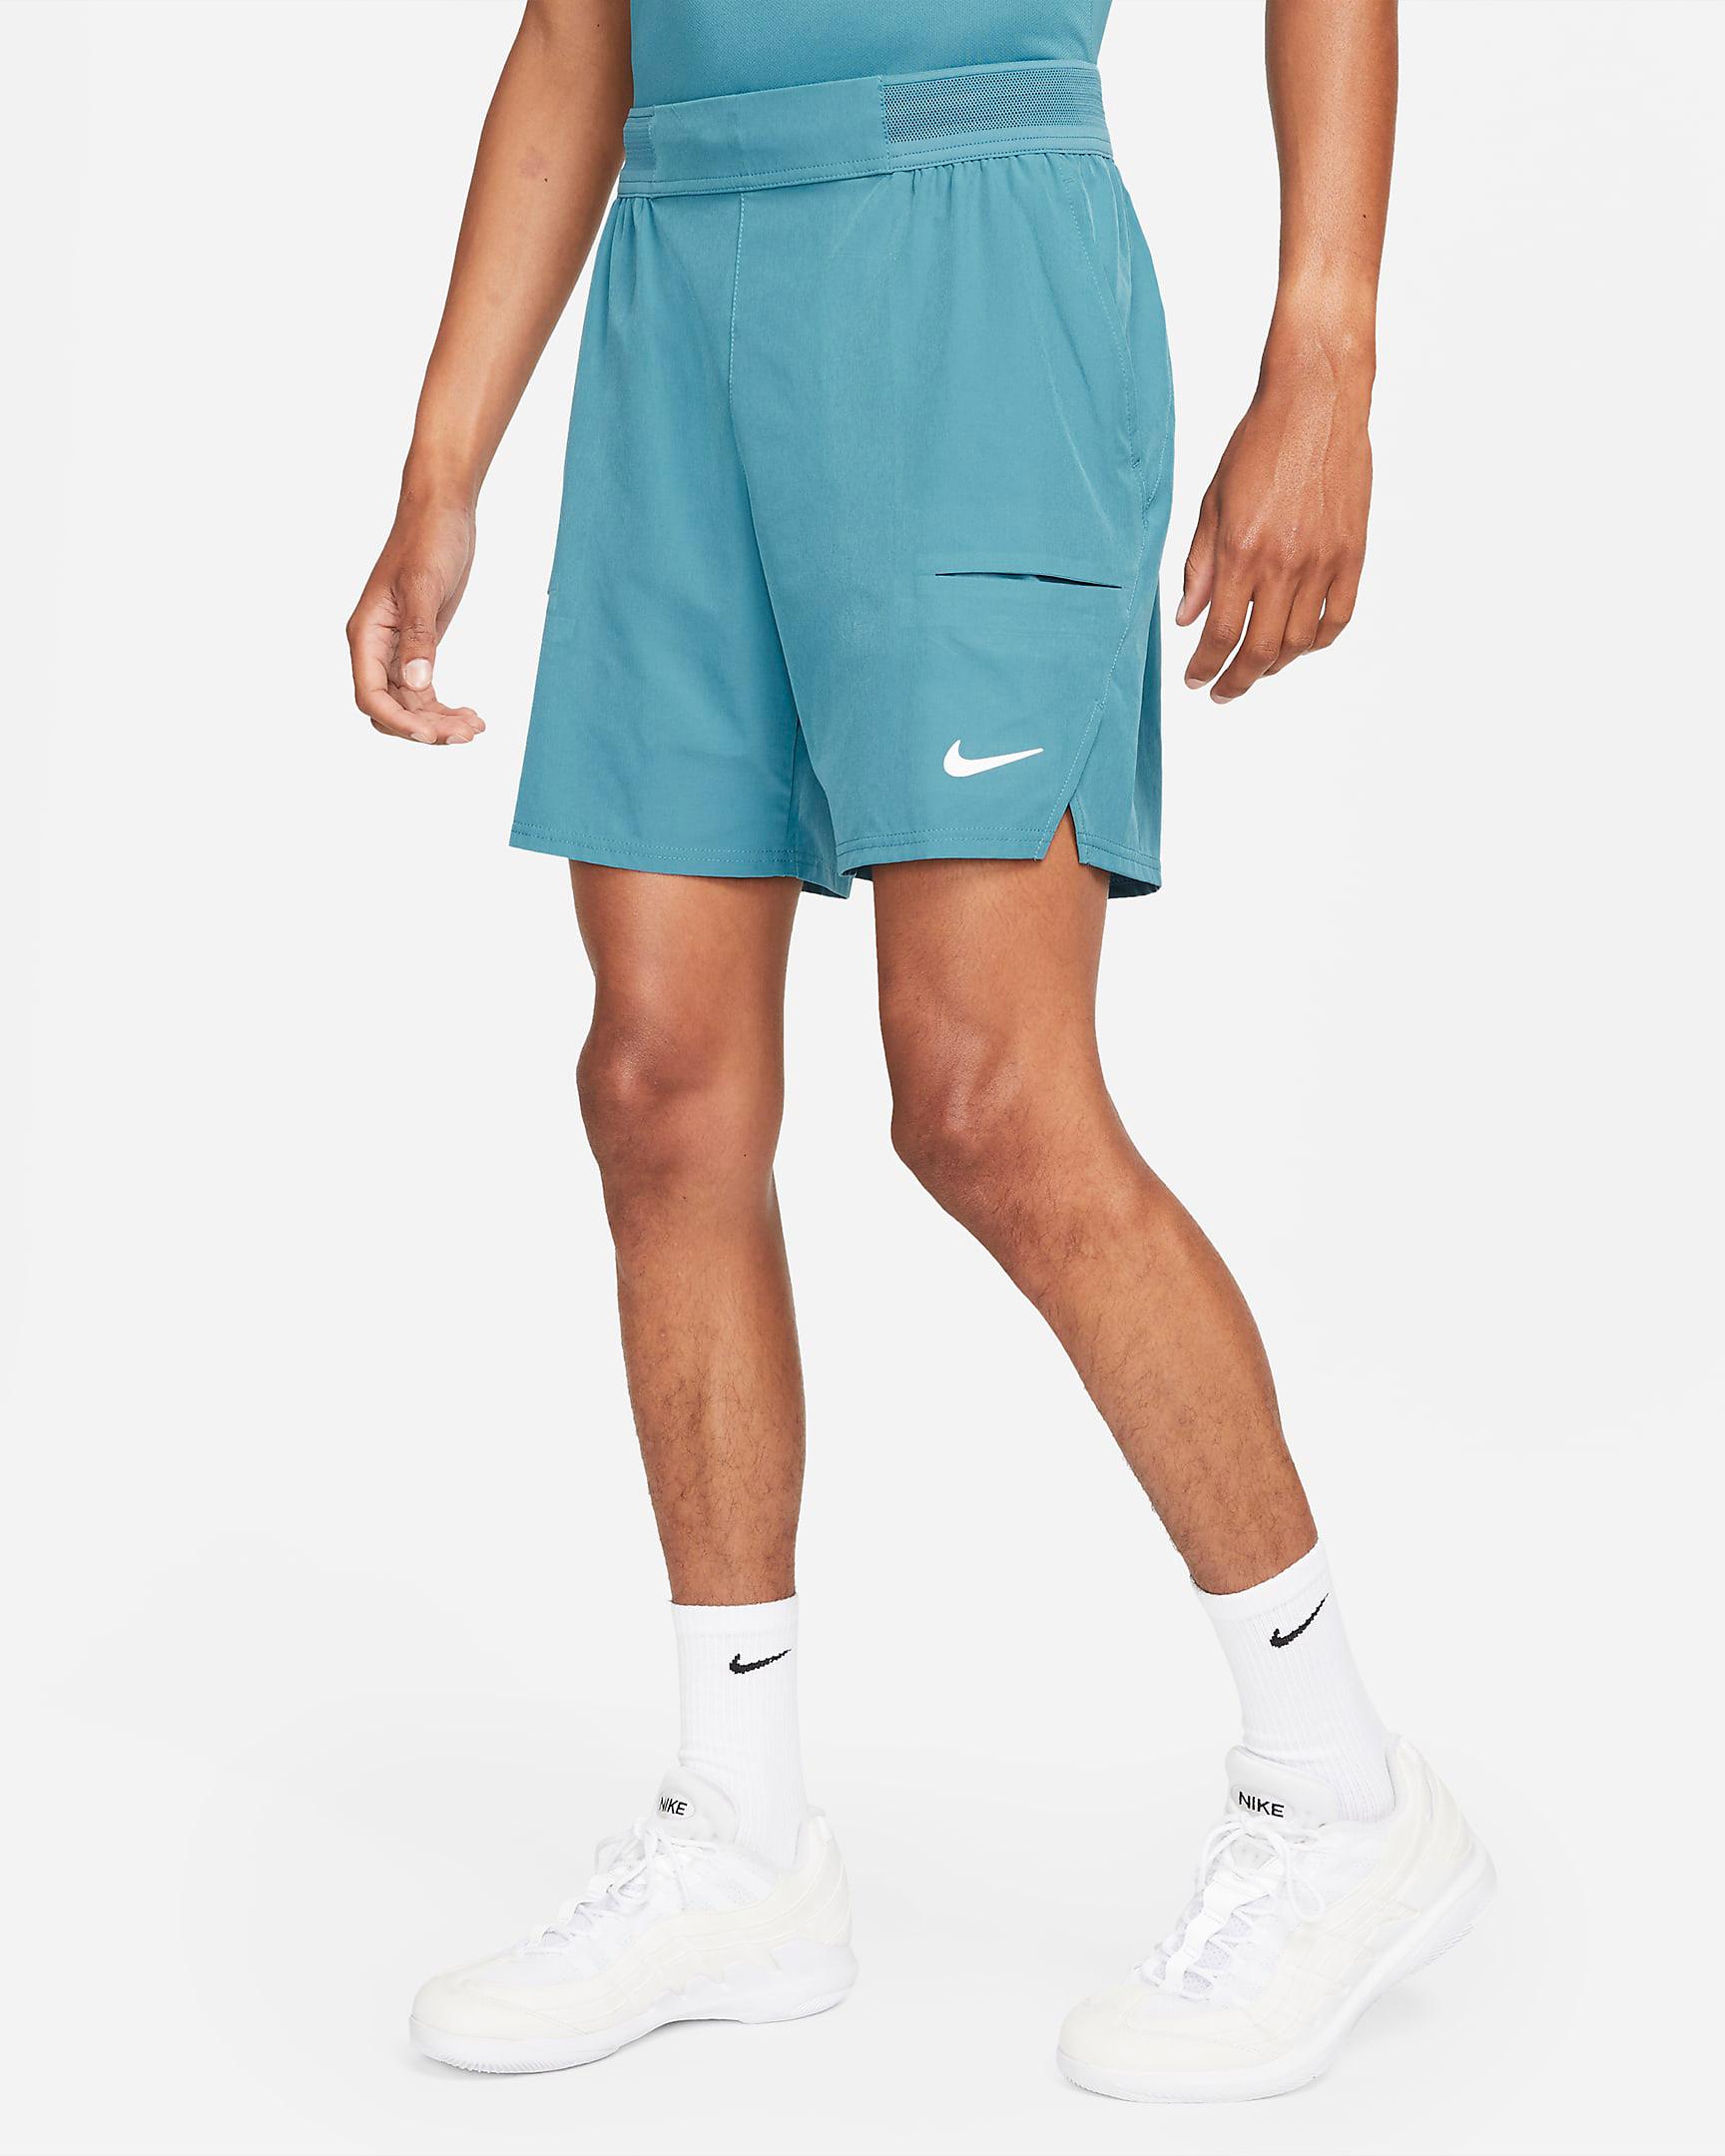 nike-rift-blue-tennis-shirt-shorts-1